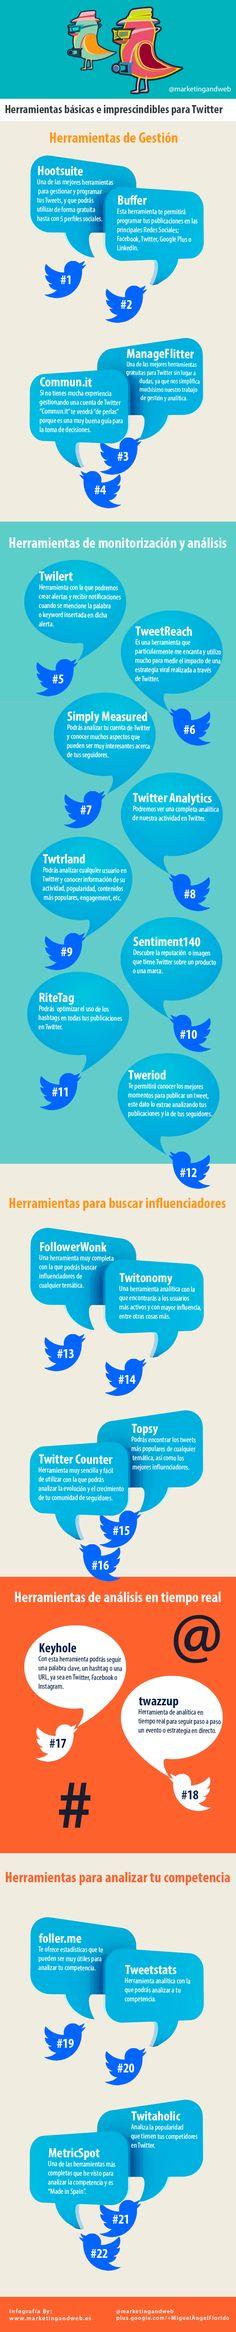 22 herramientas gratuitas para Twitter básicas e imprescindibles